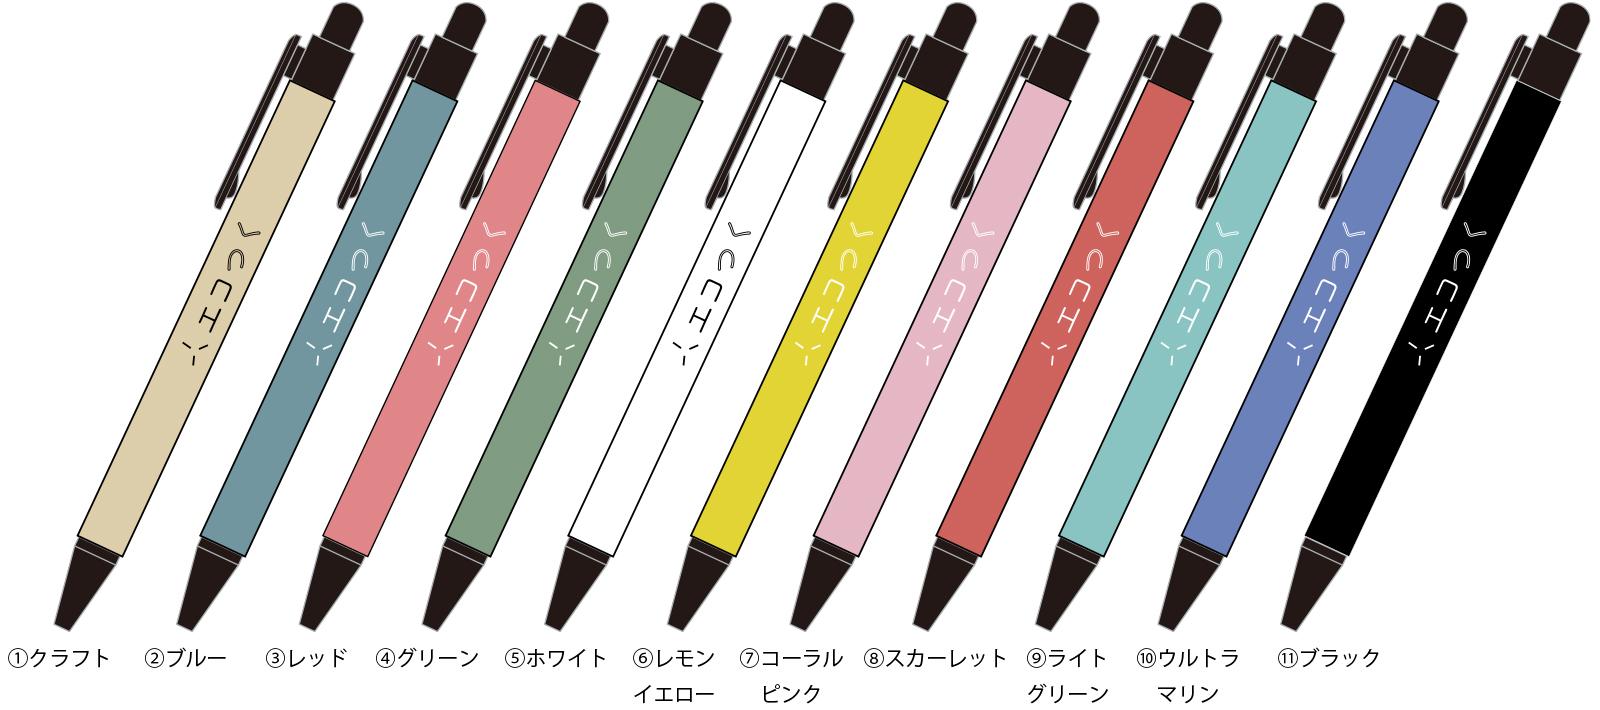 kamipenノック式ペン本体色カラー見本